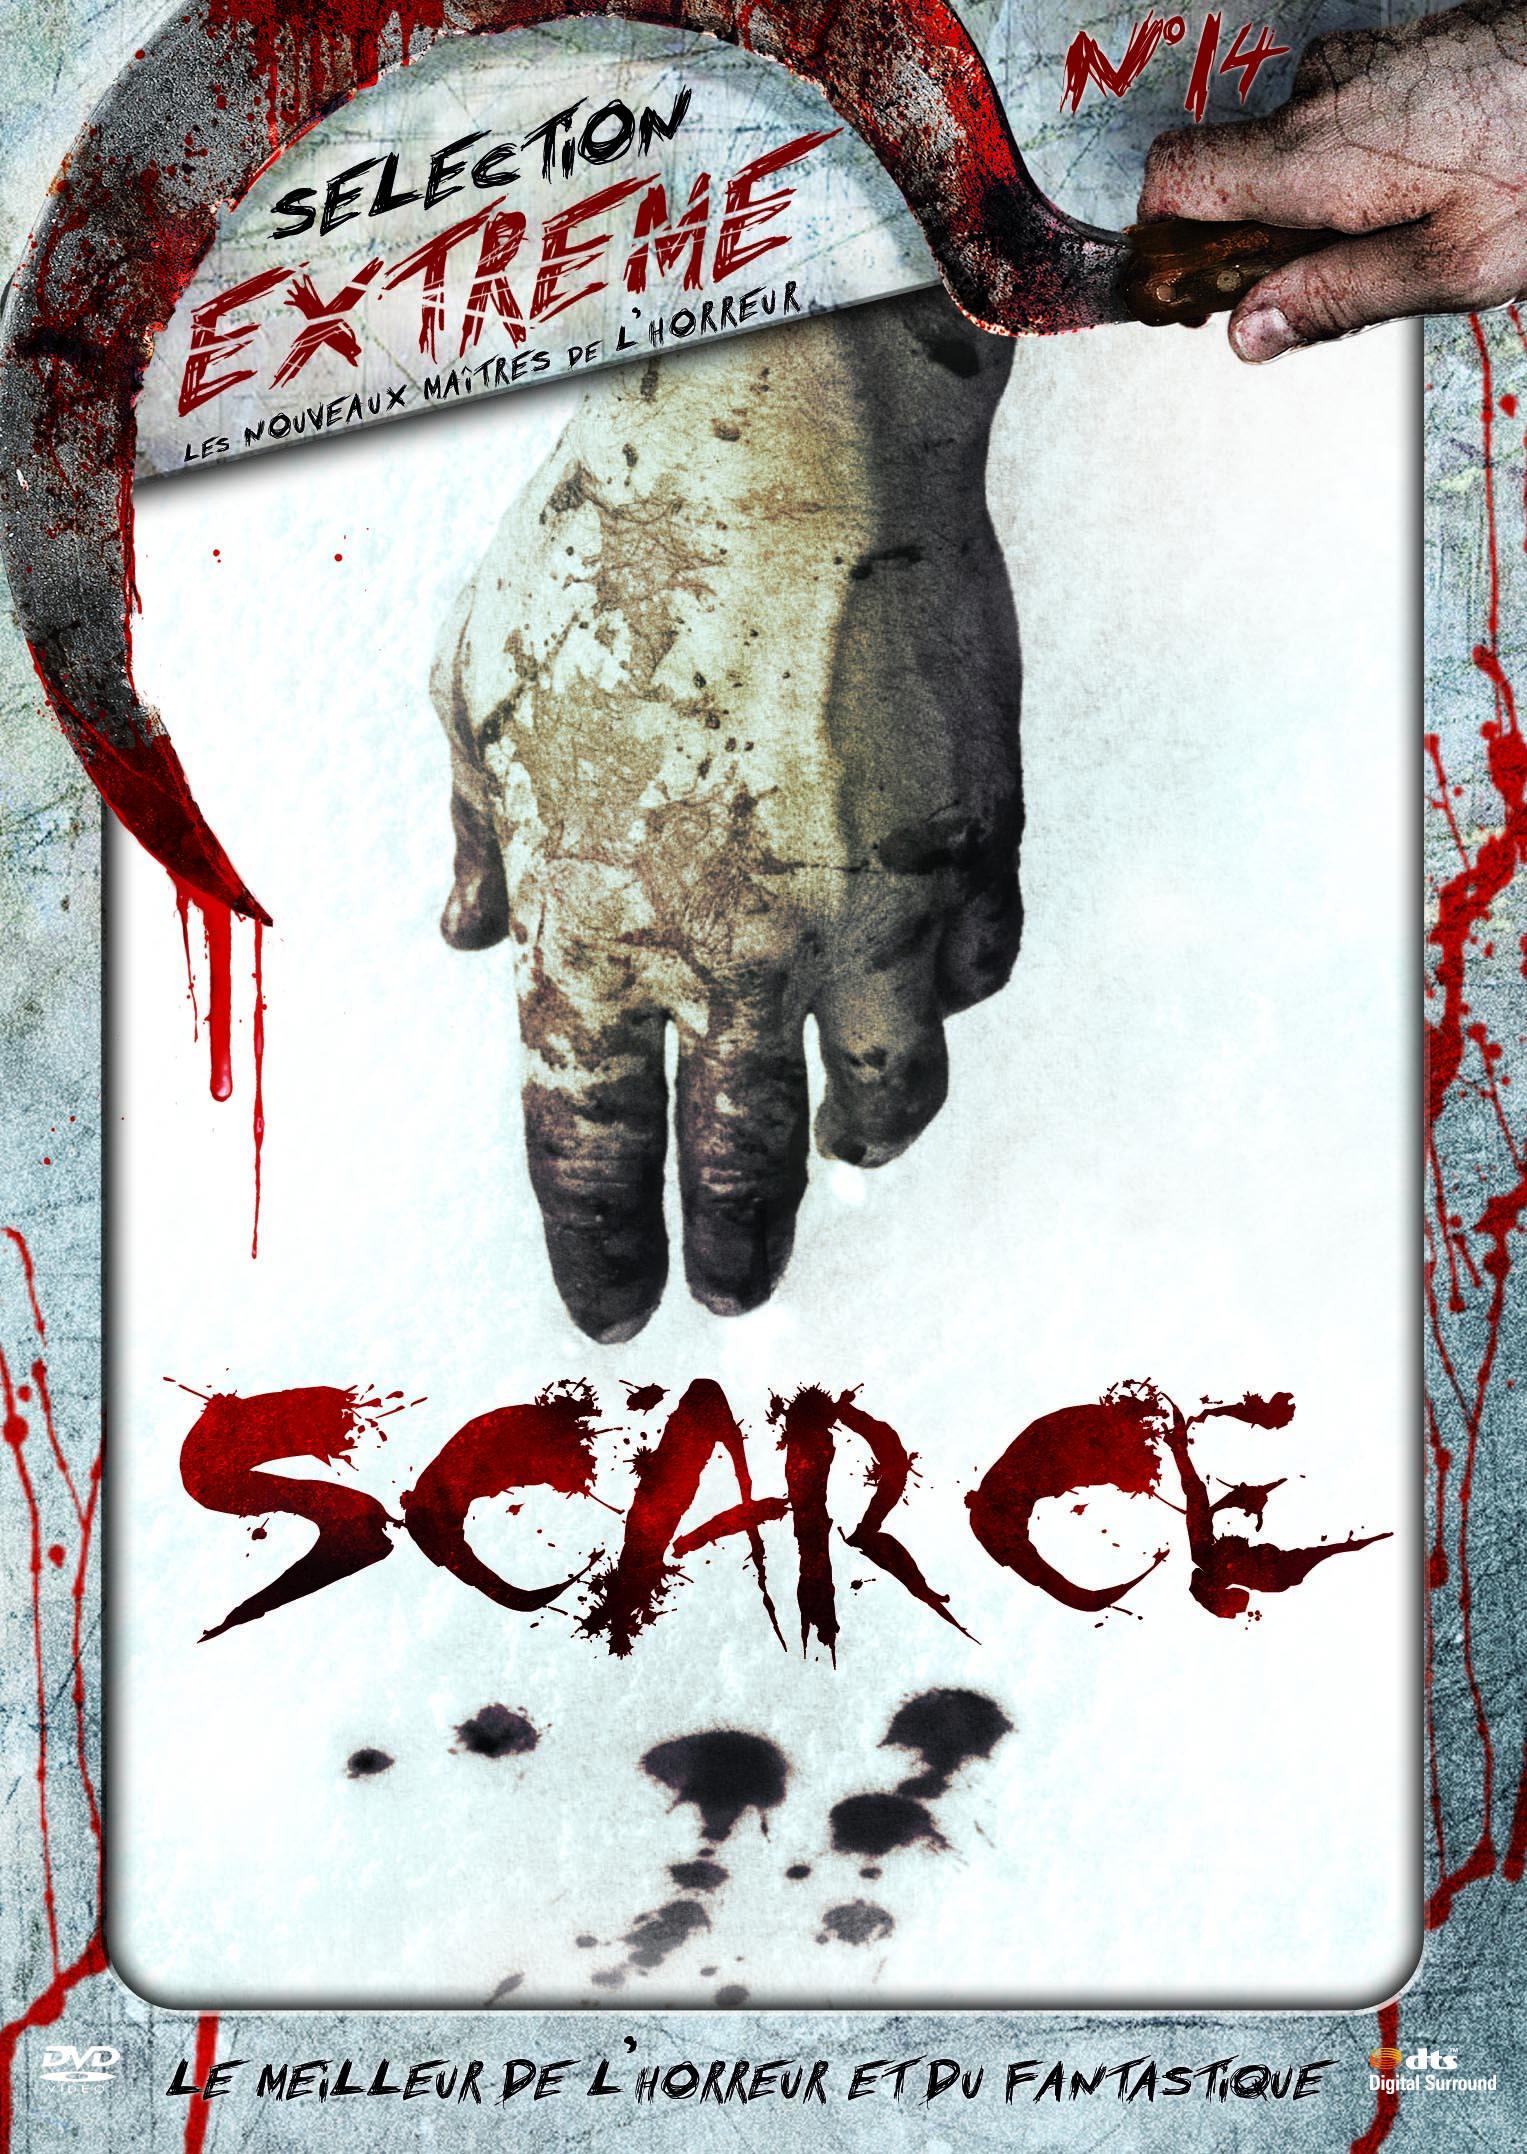 Extreme - scarce - dvd